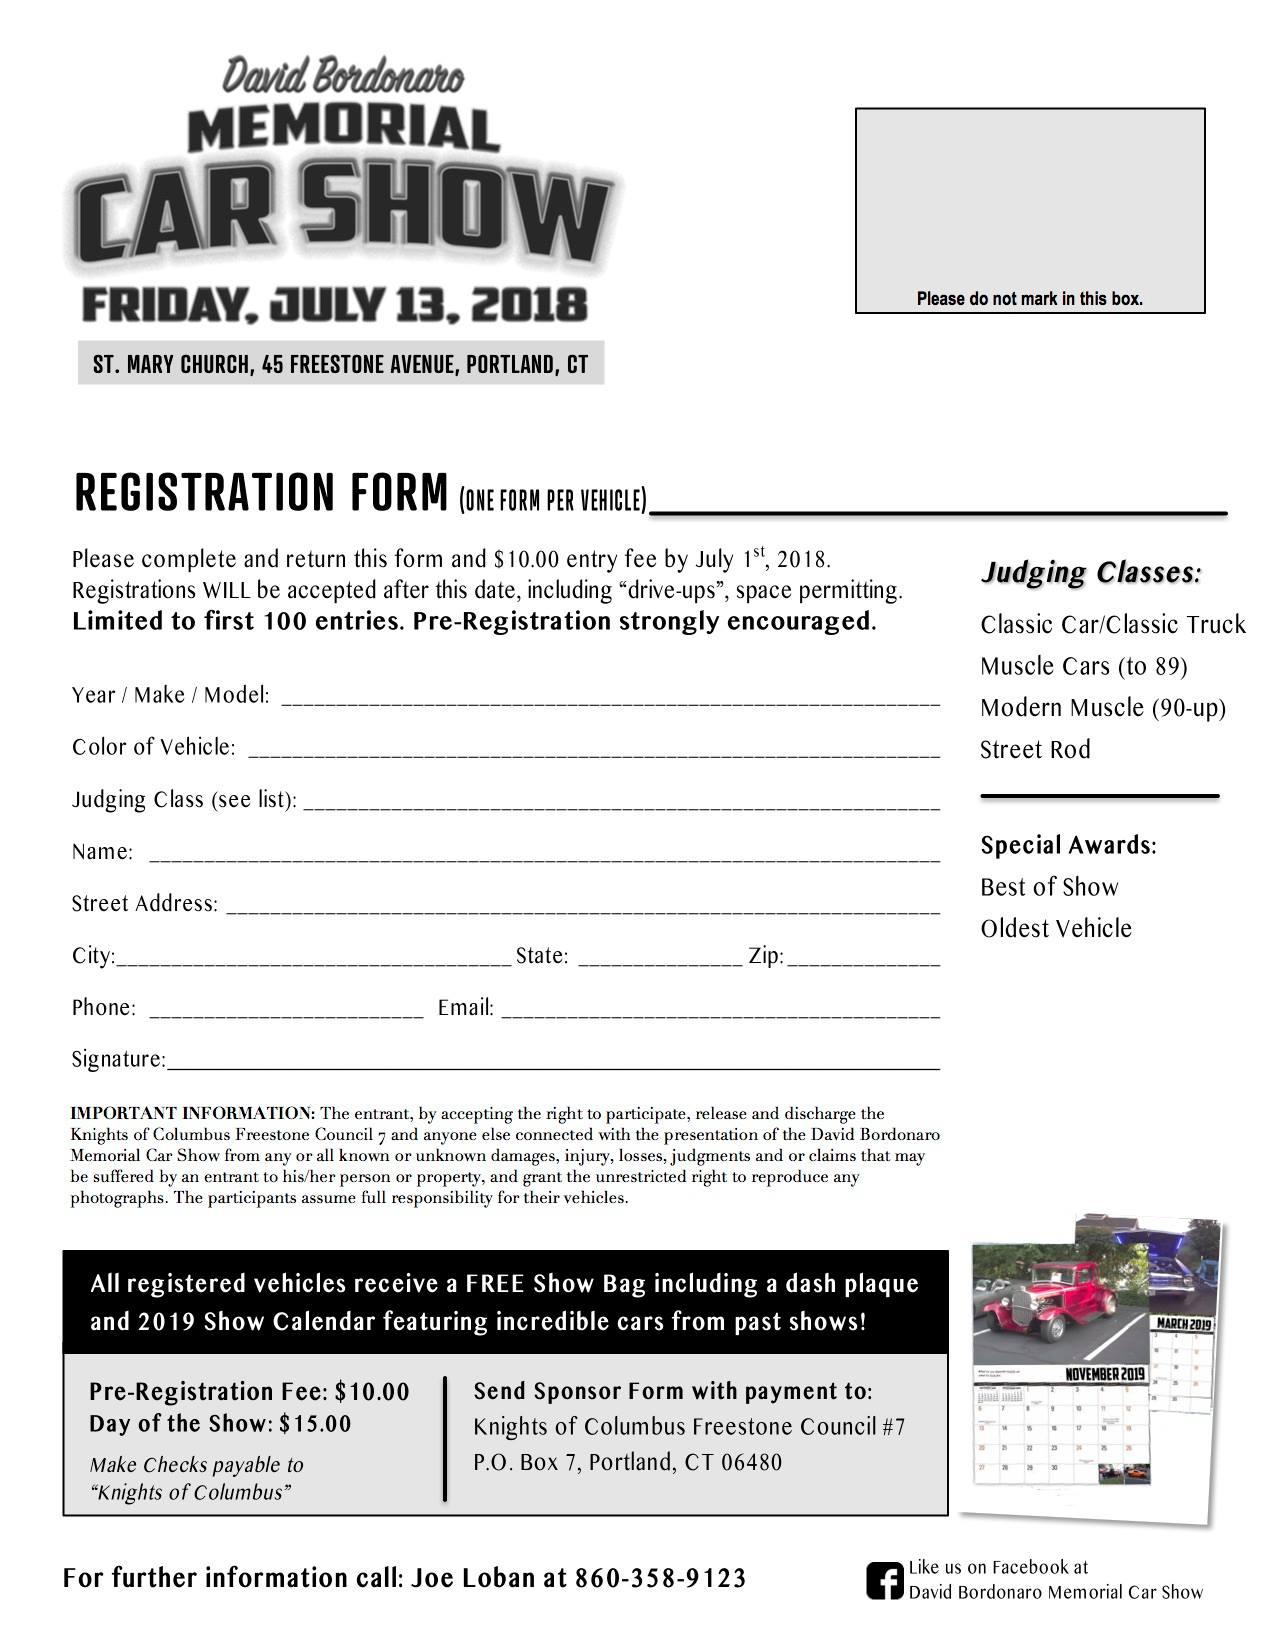 SAAC - Calendar of Selected Upcoming Shoreline-Area Antique Auto Events